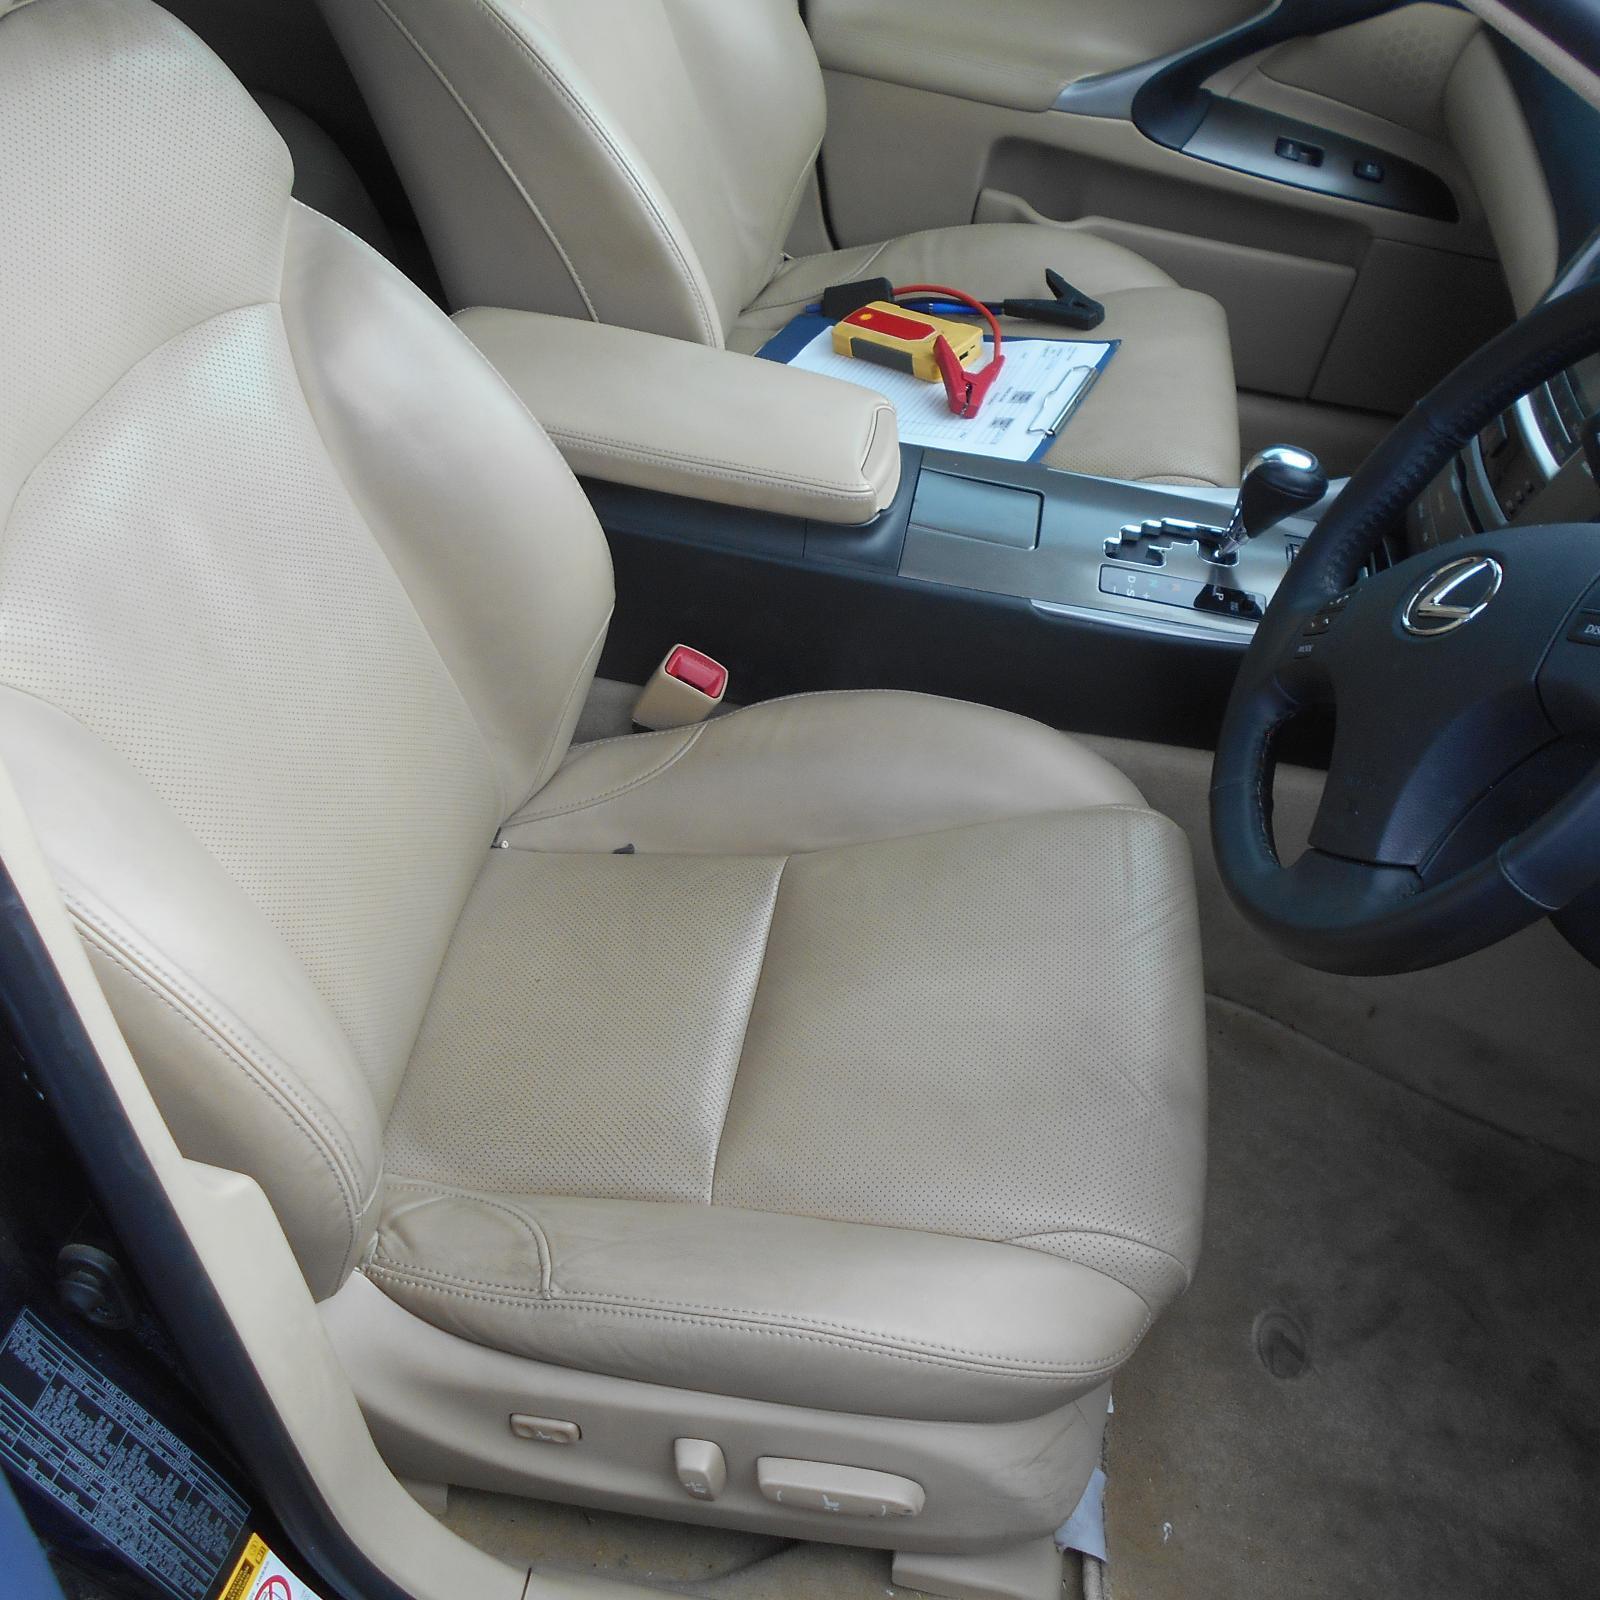 LEXUS IS250/IS250C, Front Seat, RH FRONT, GSE20R, IS250/IS350, LEATHER, BEIGE, PRESTIGE/X, 11/05-06/13